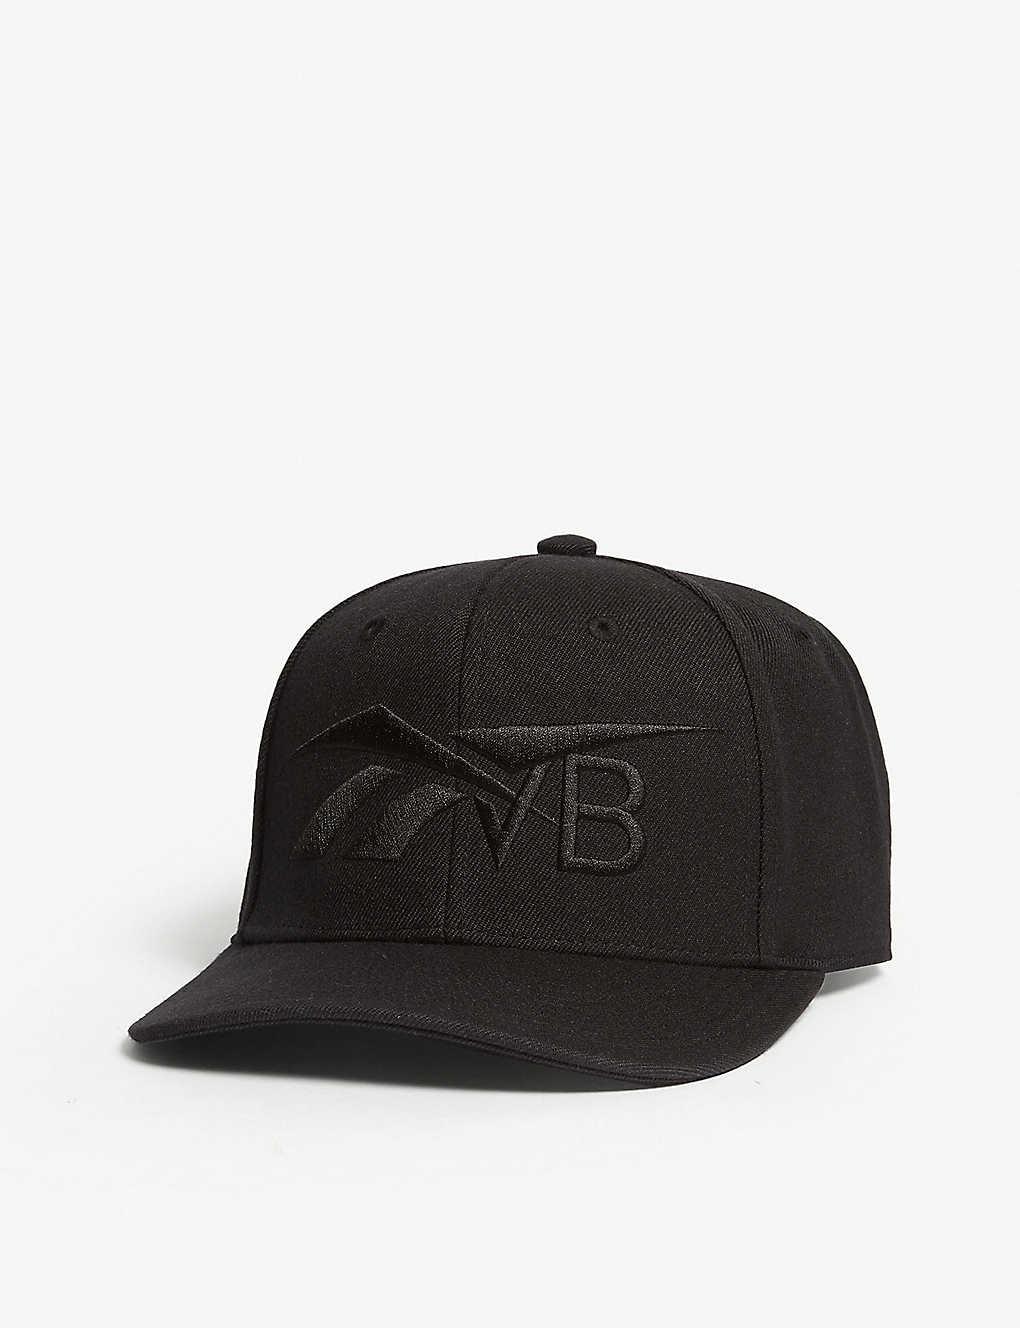 7597a126 REEBOK X VICTORIA BECKHAM - Reebok x Victoria Beckham logo snapback ...